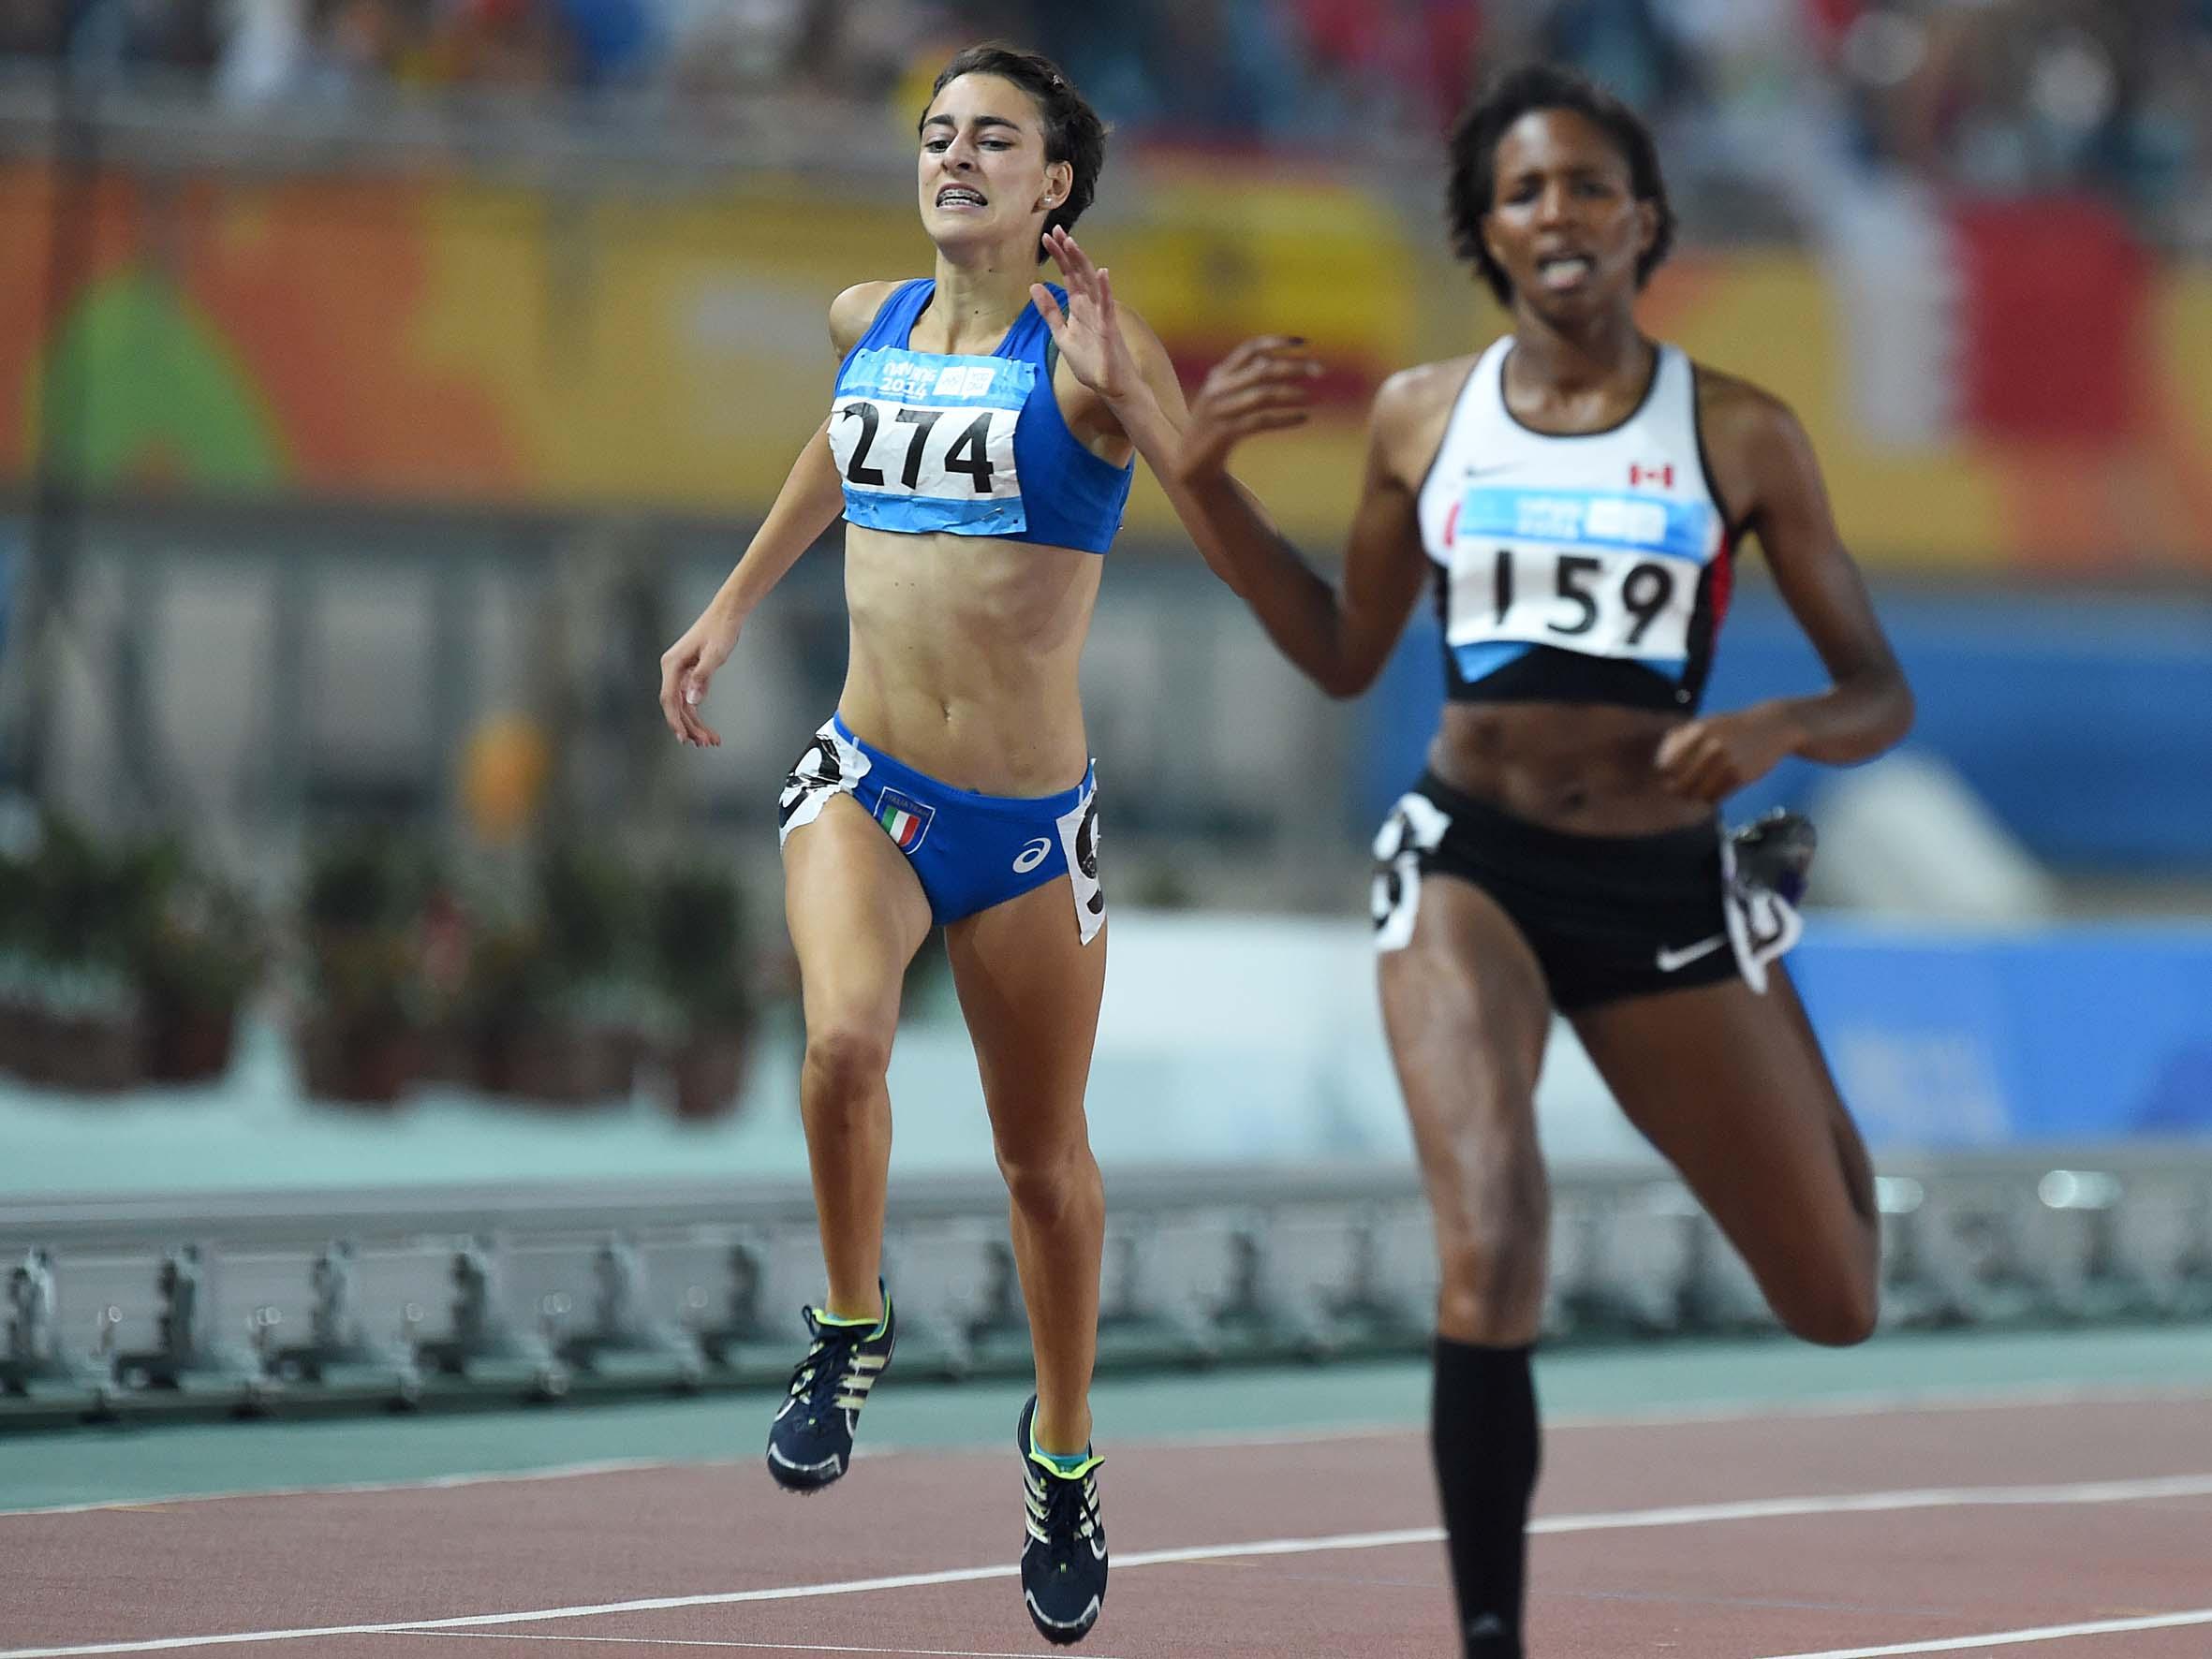 Atletica donne 400 metri 03